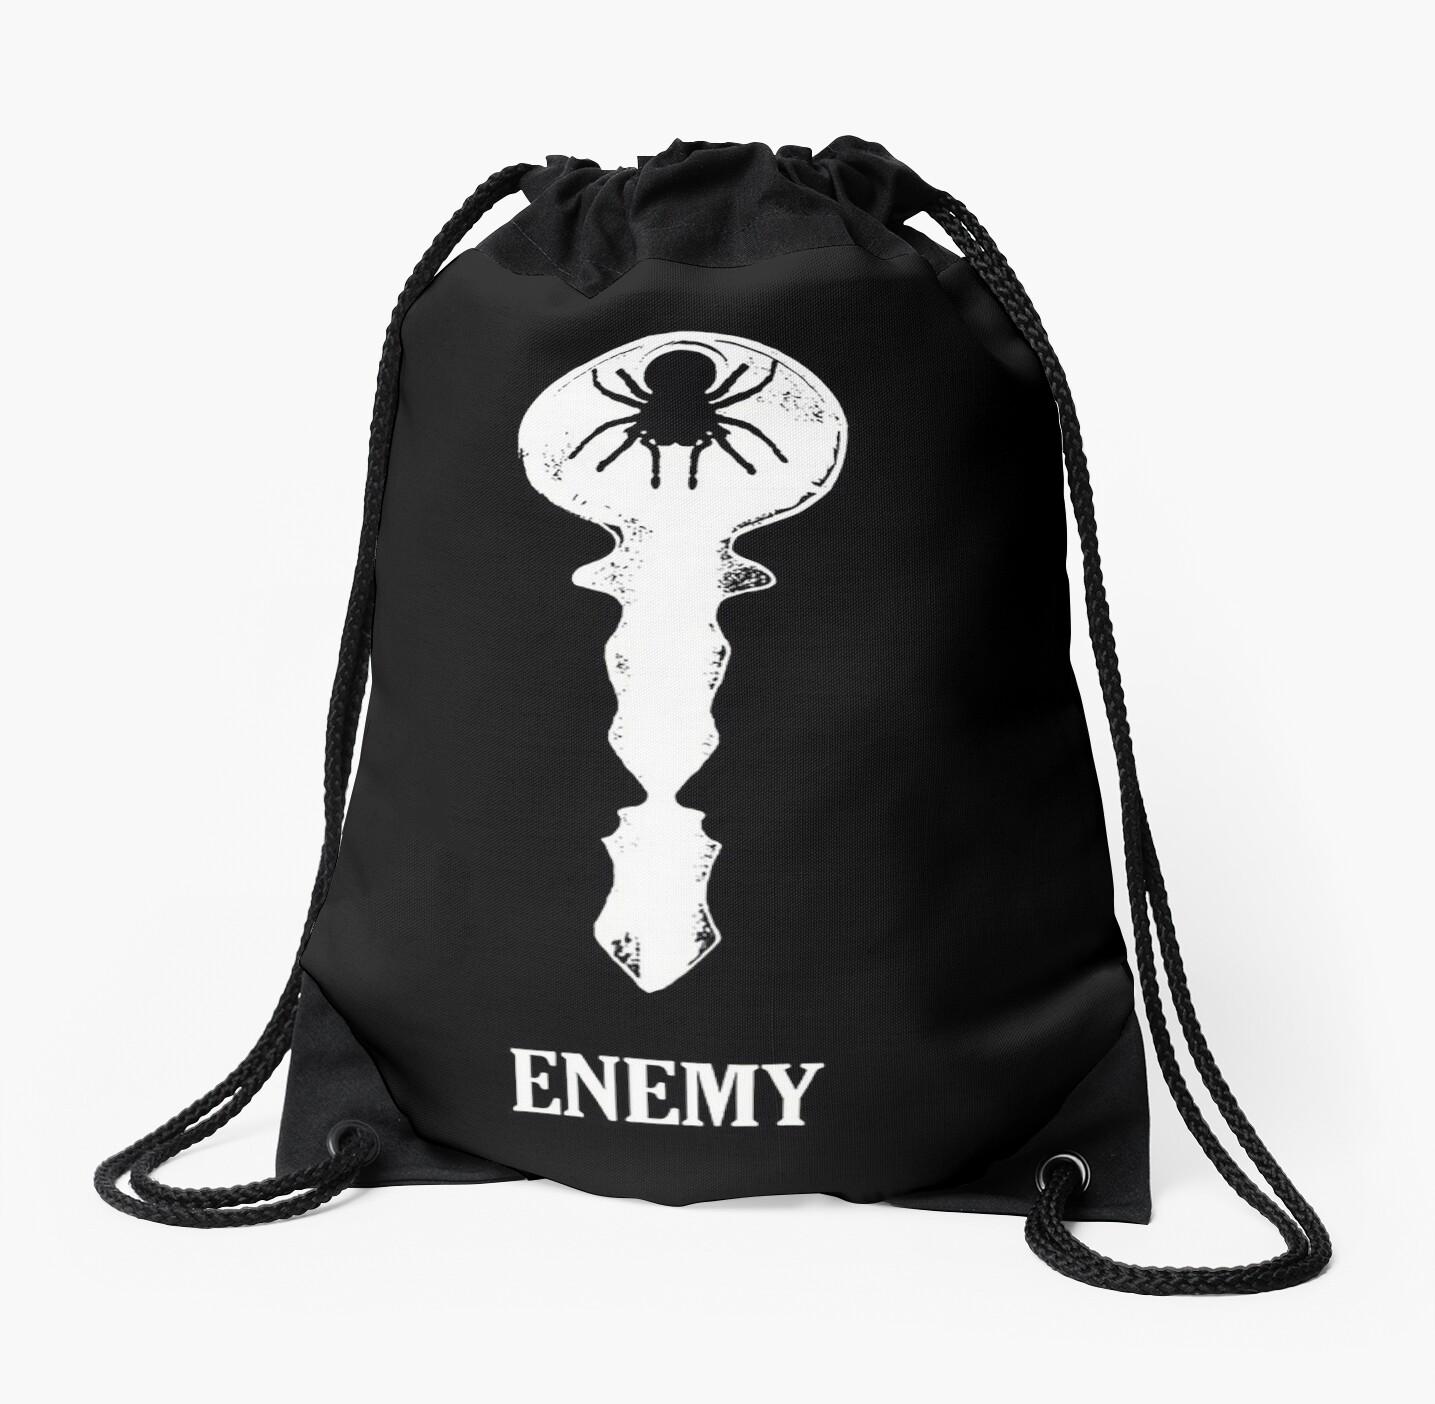 Enemy by DAstora